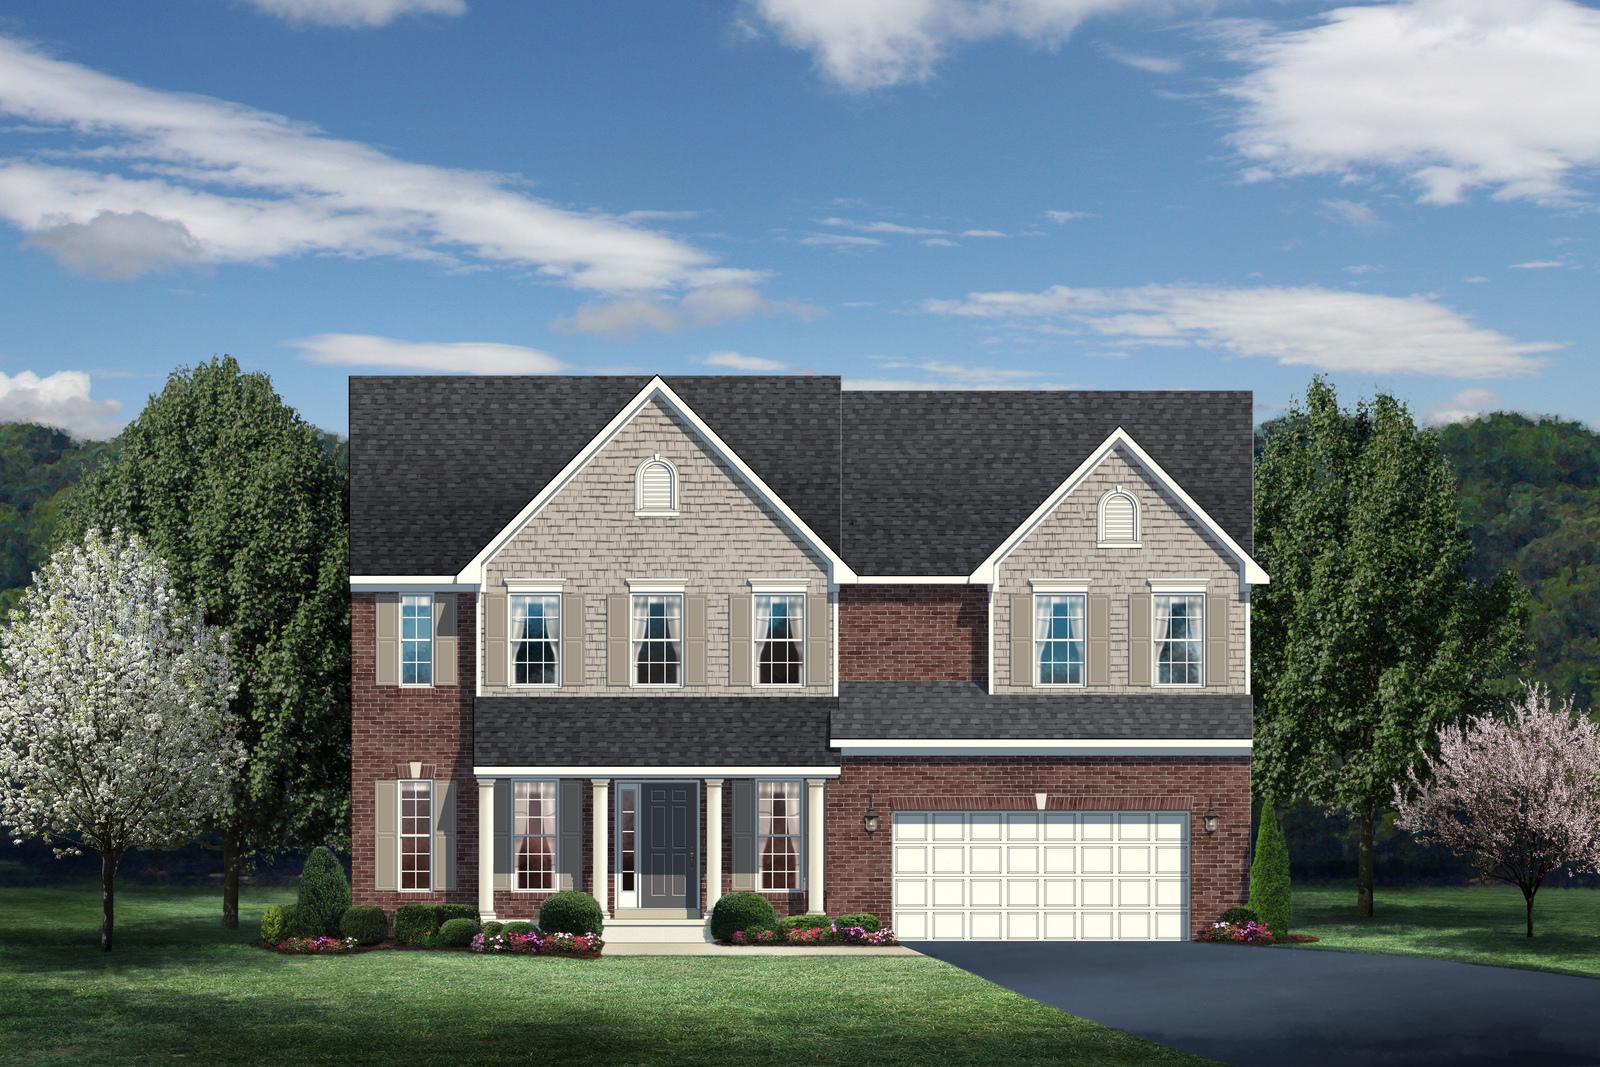 New palermo home model for sale heartland homes for Heartland house